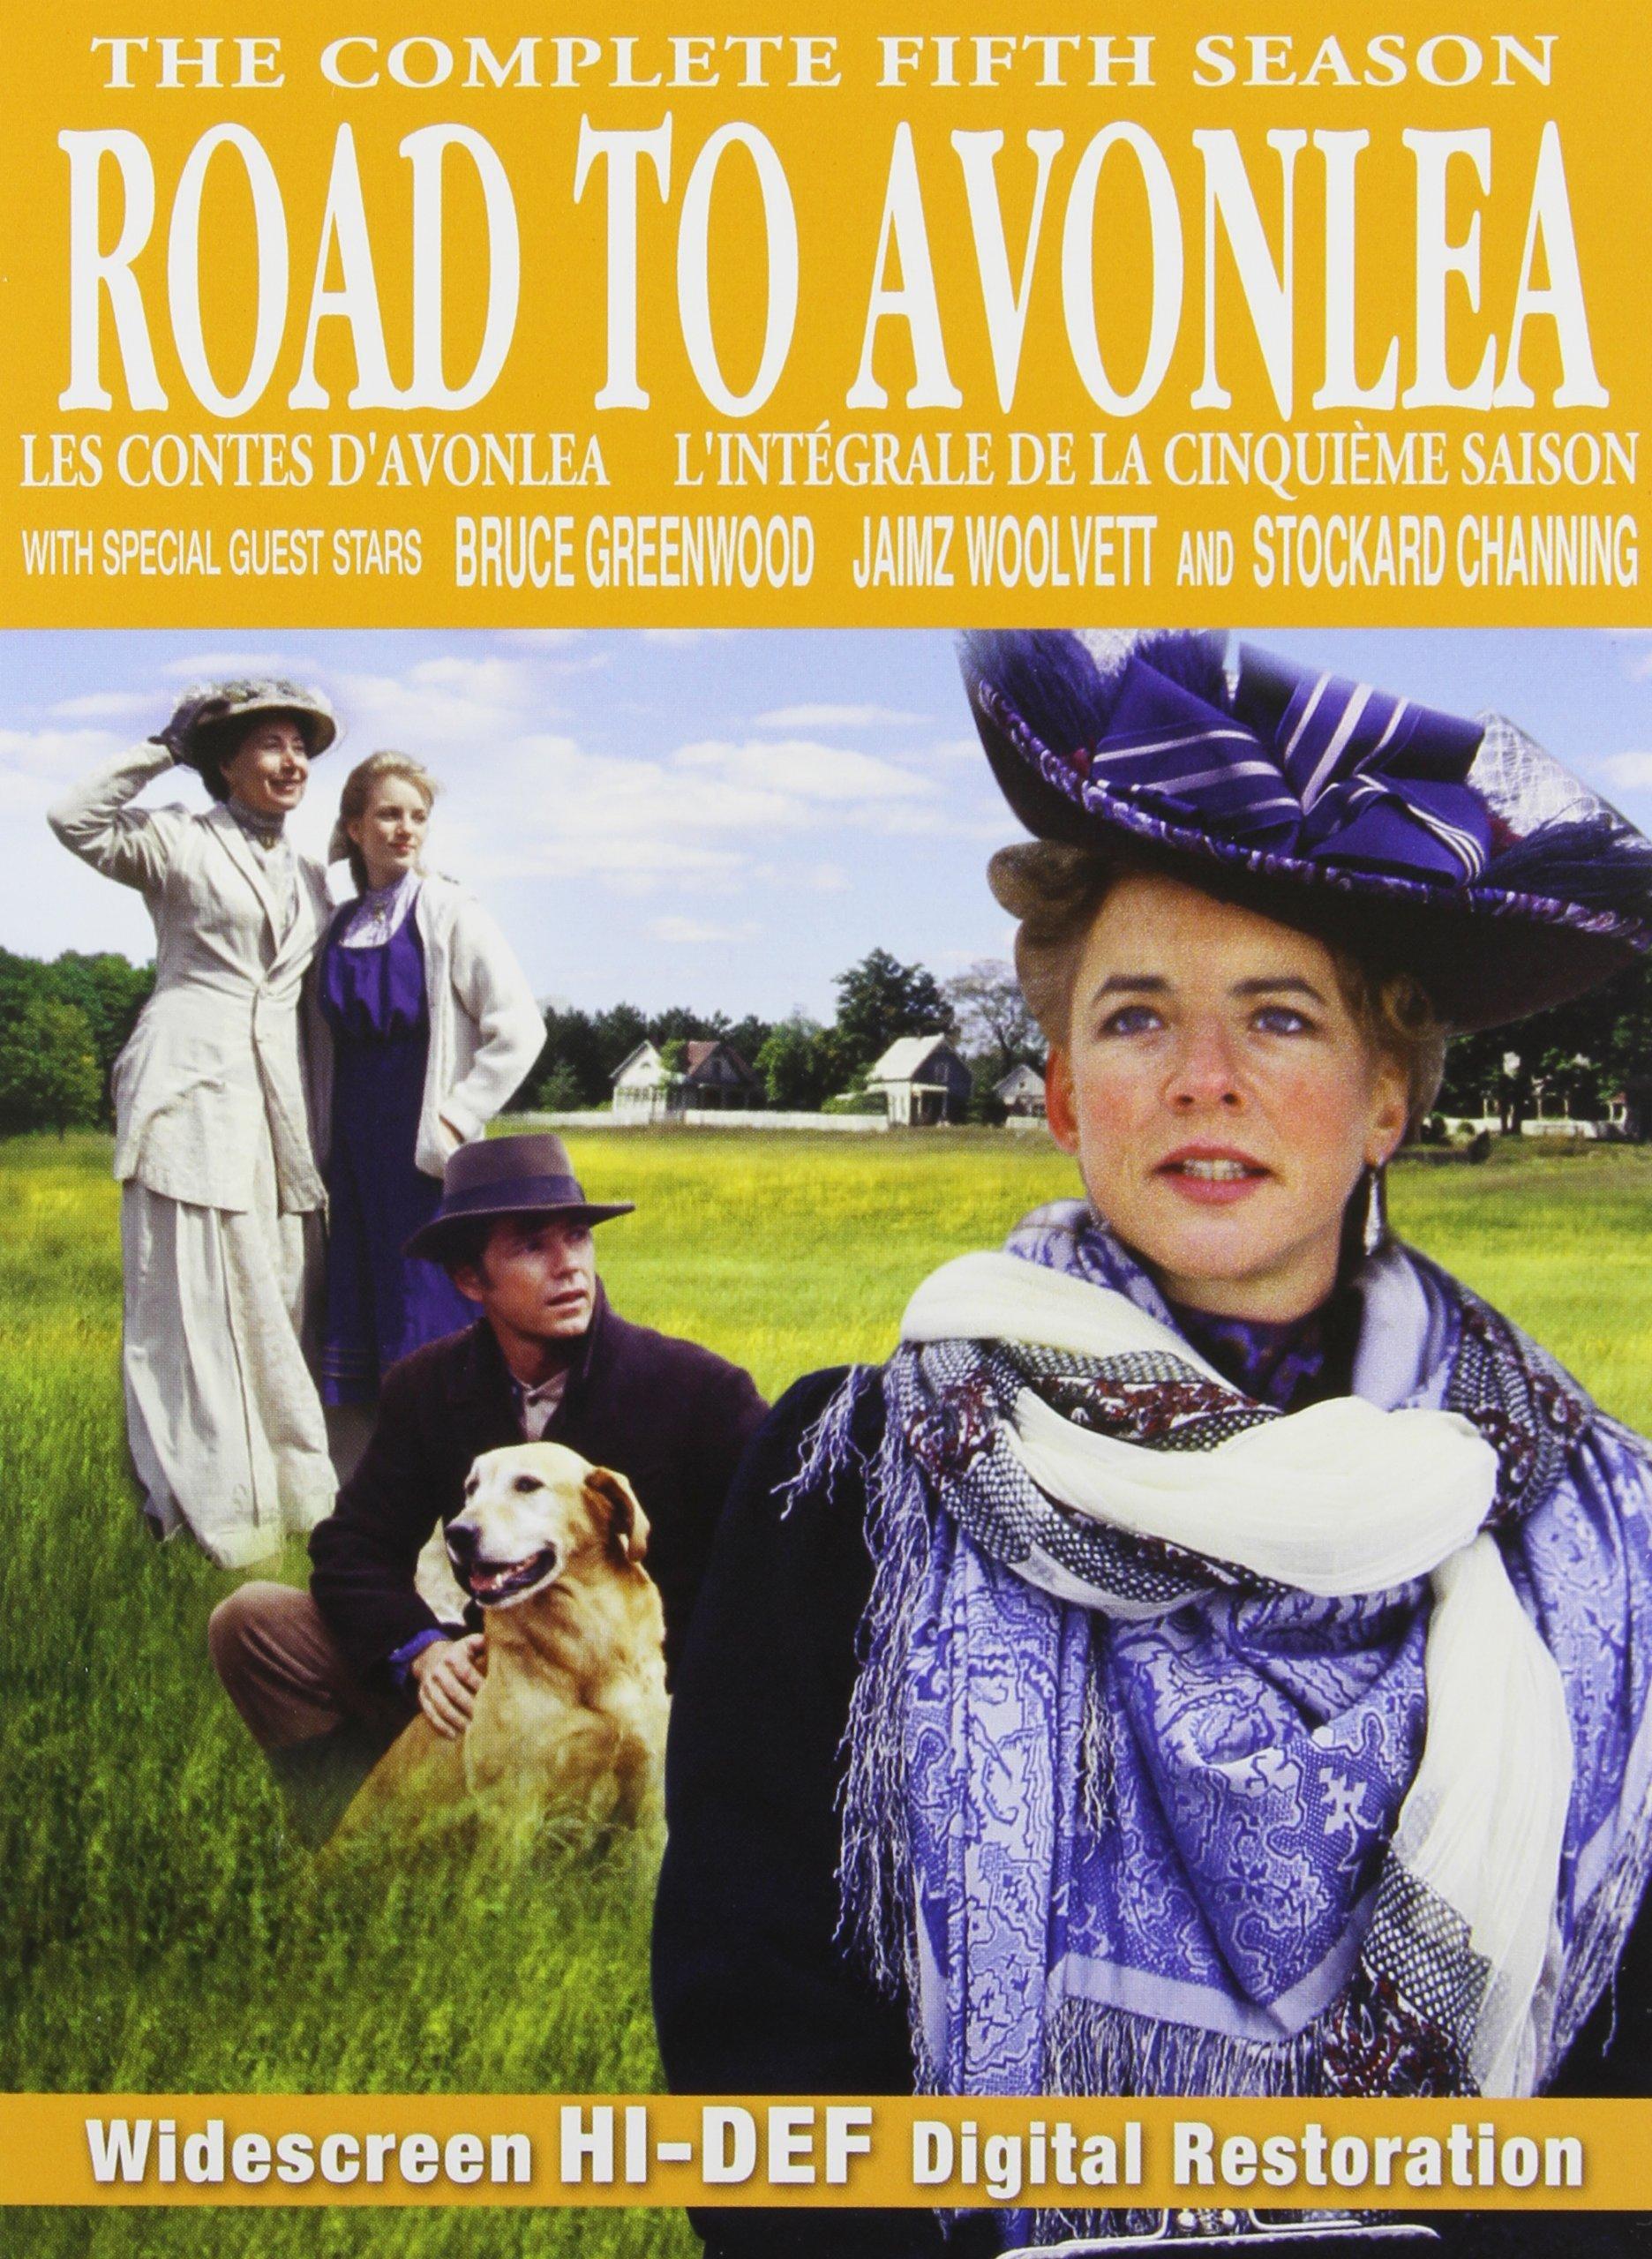 The Road to Avonlea: Season 5